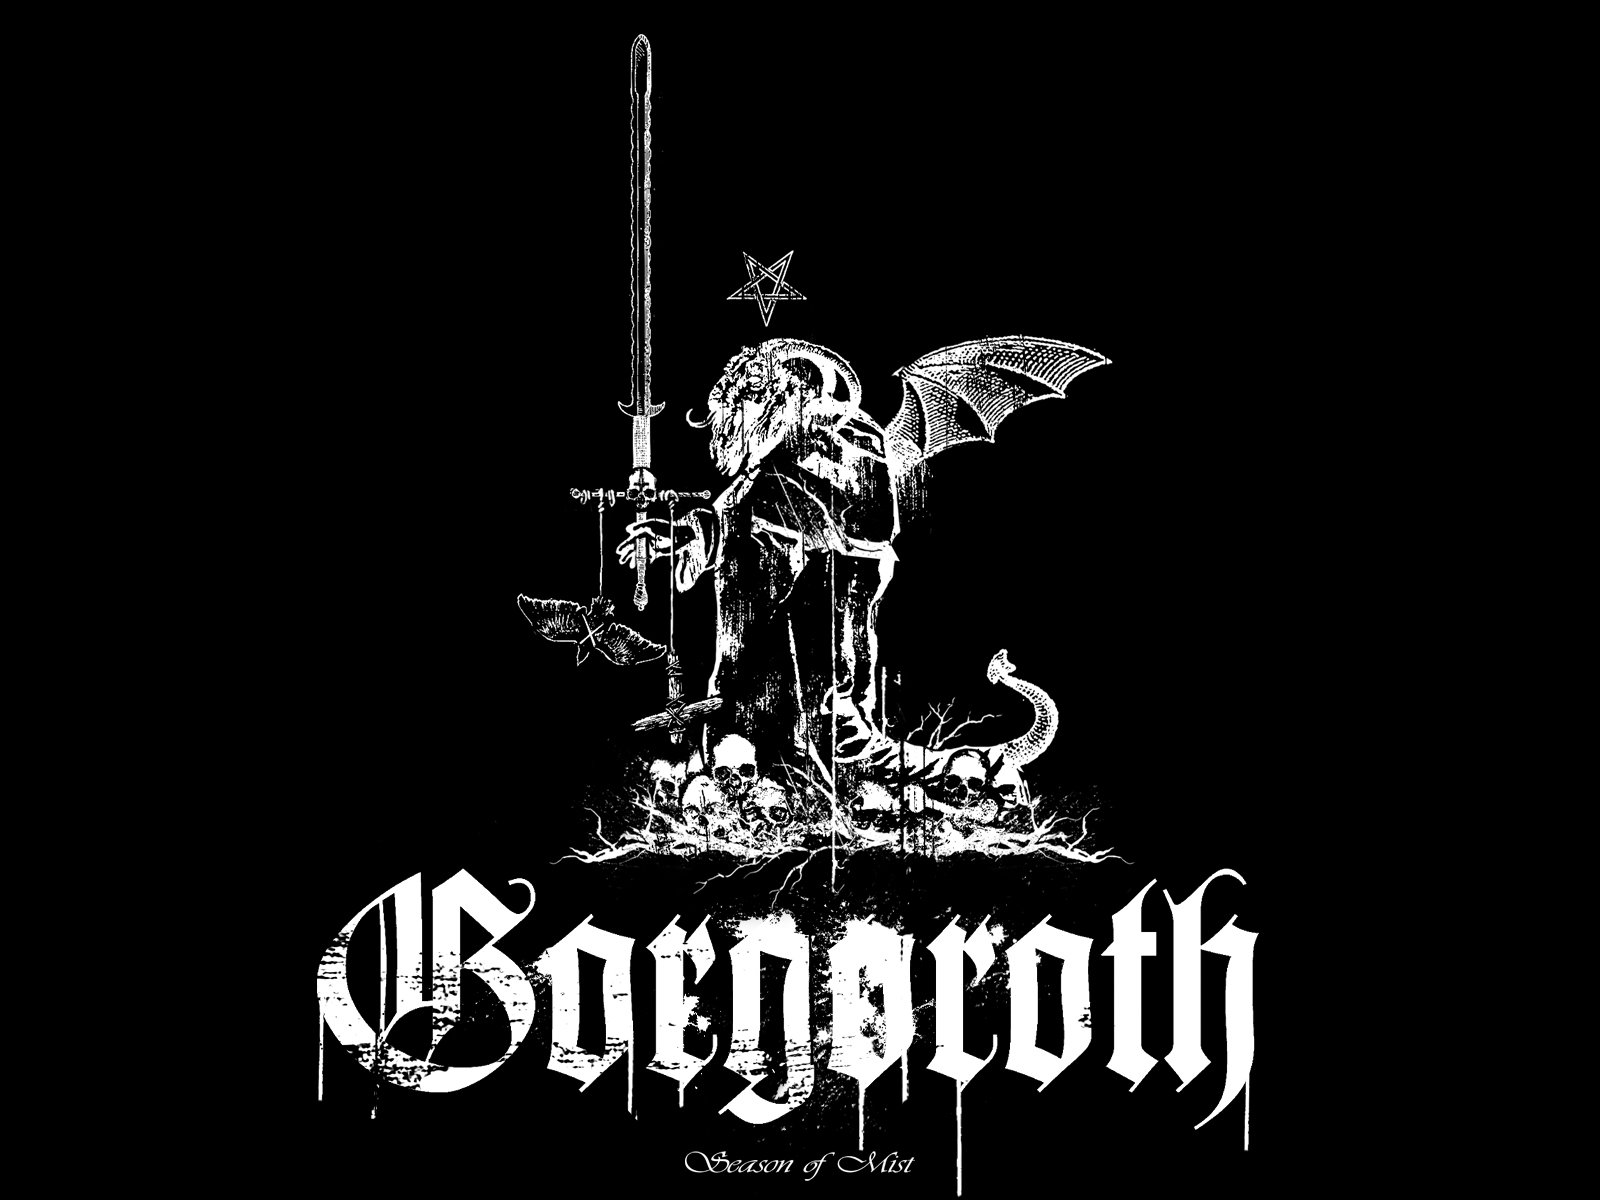 Black metal gorgoroth wallpaper 1600x1200 297794 - Black metal wallpaper ...